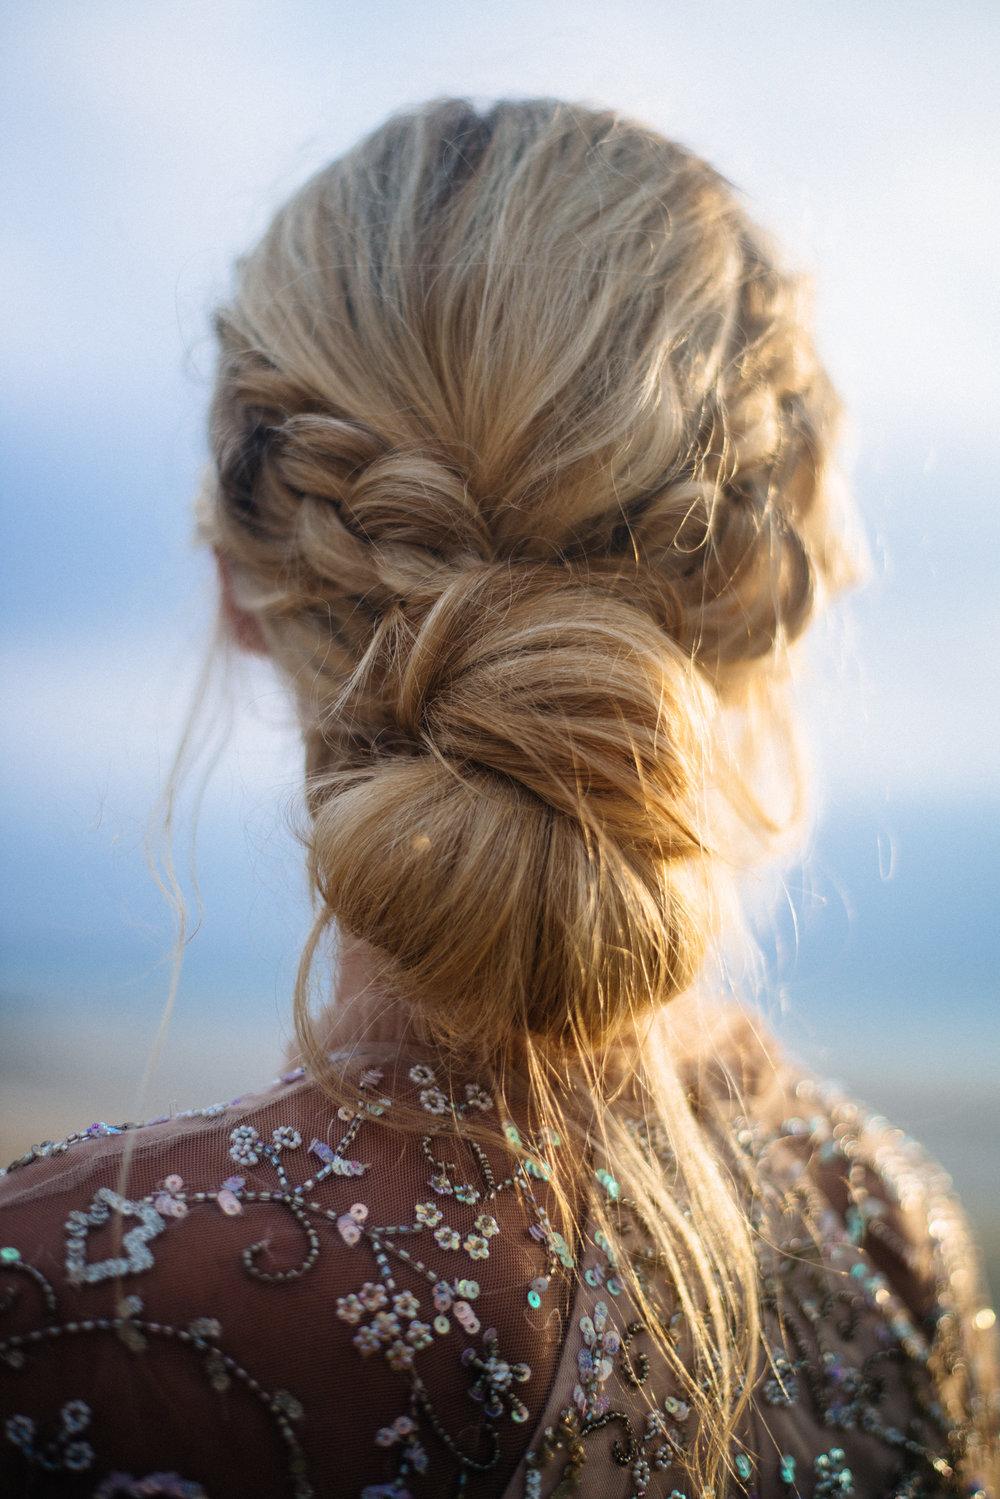 Cornwall wedding hair